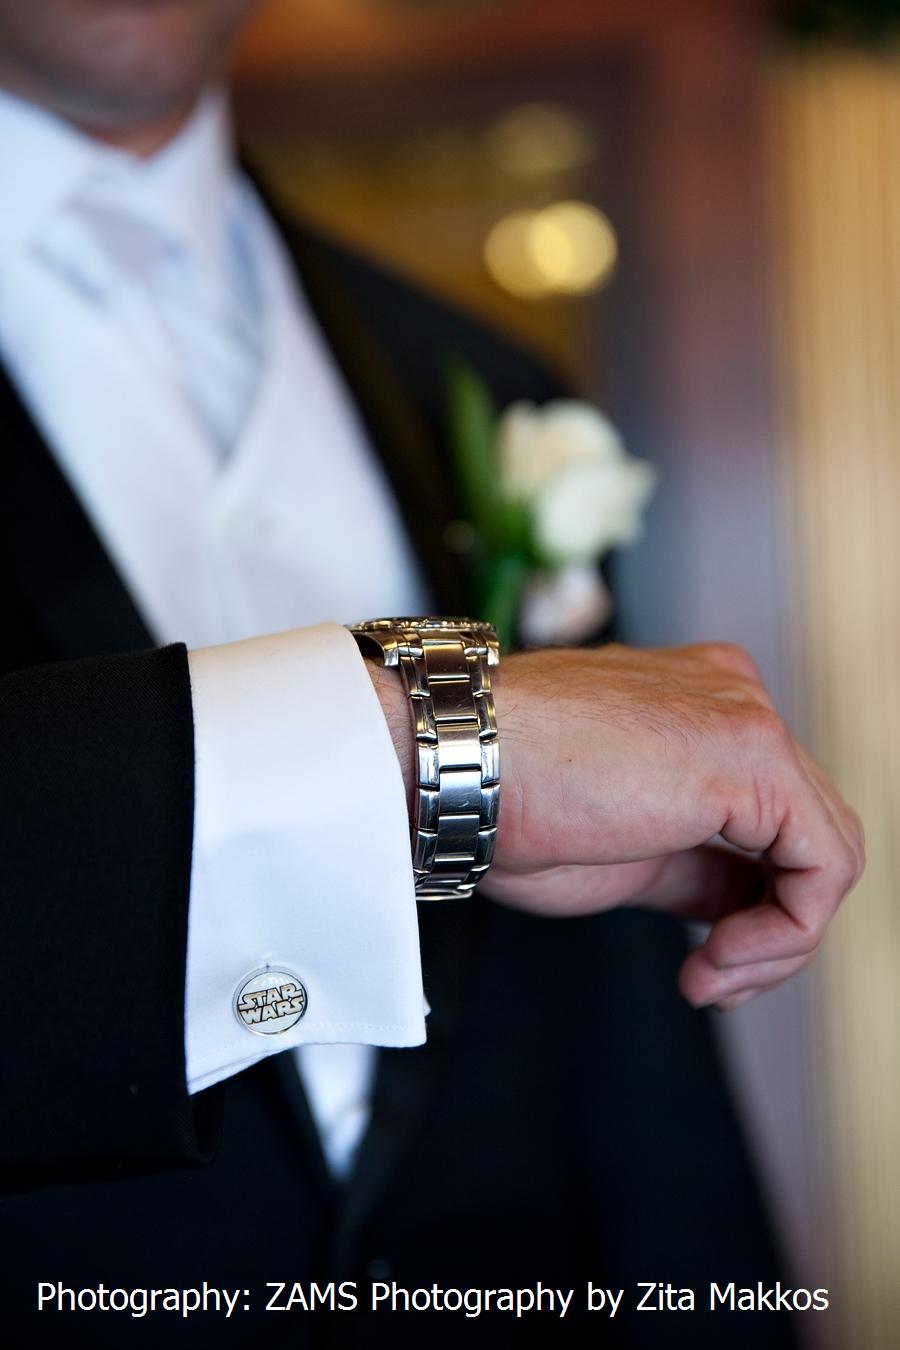 ambigram_cuff_links_men_wedding_groomsmen_groom_gifts_cufflinks_2.jpg